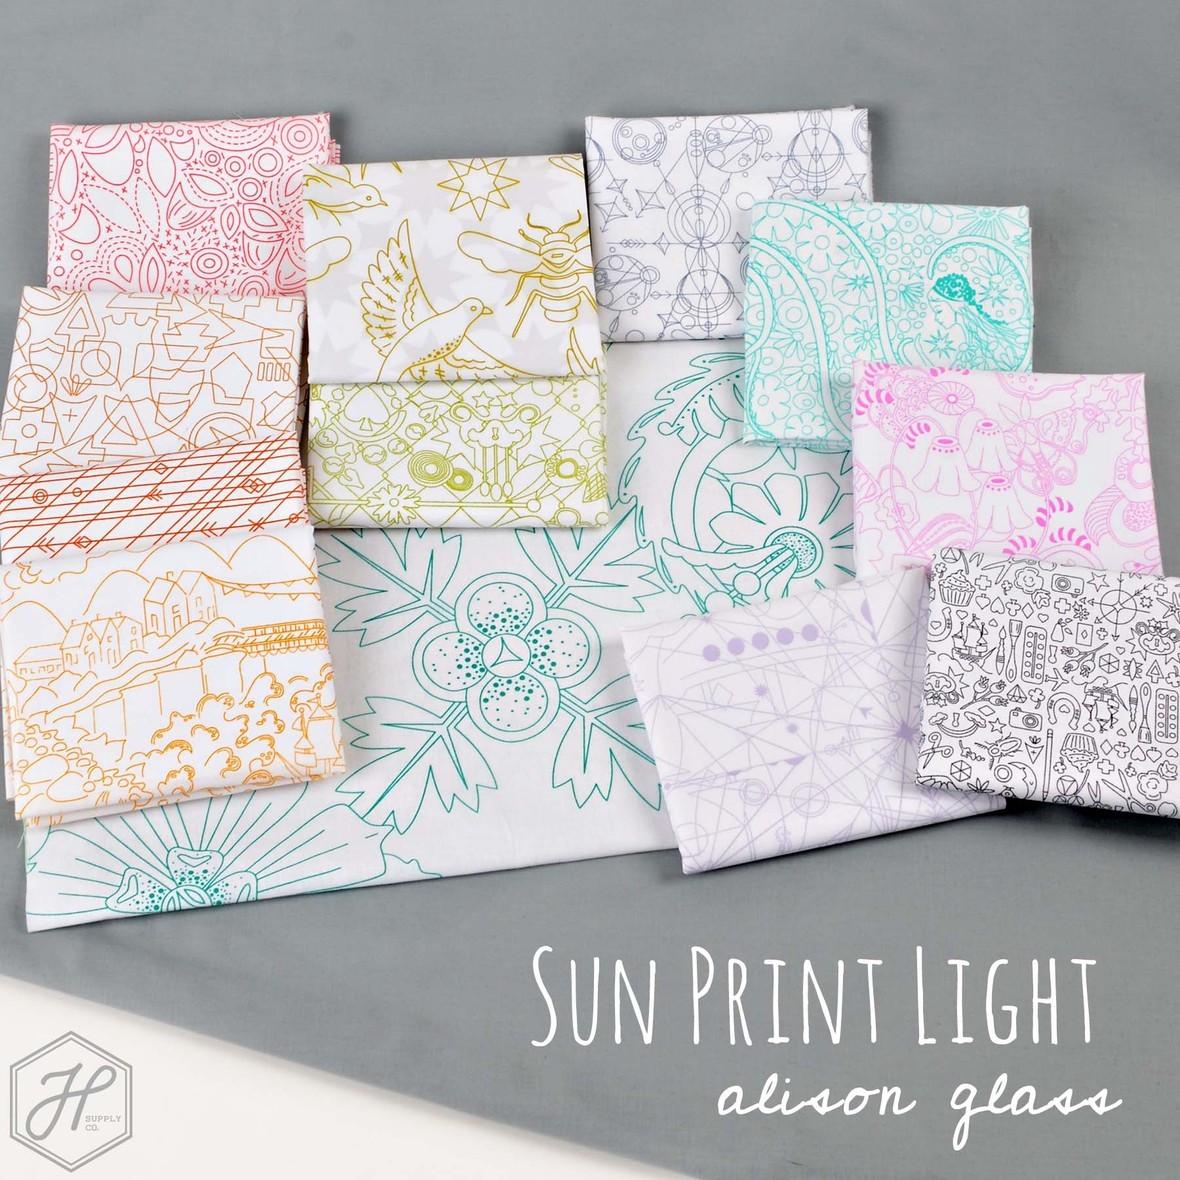 Sun Print Light